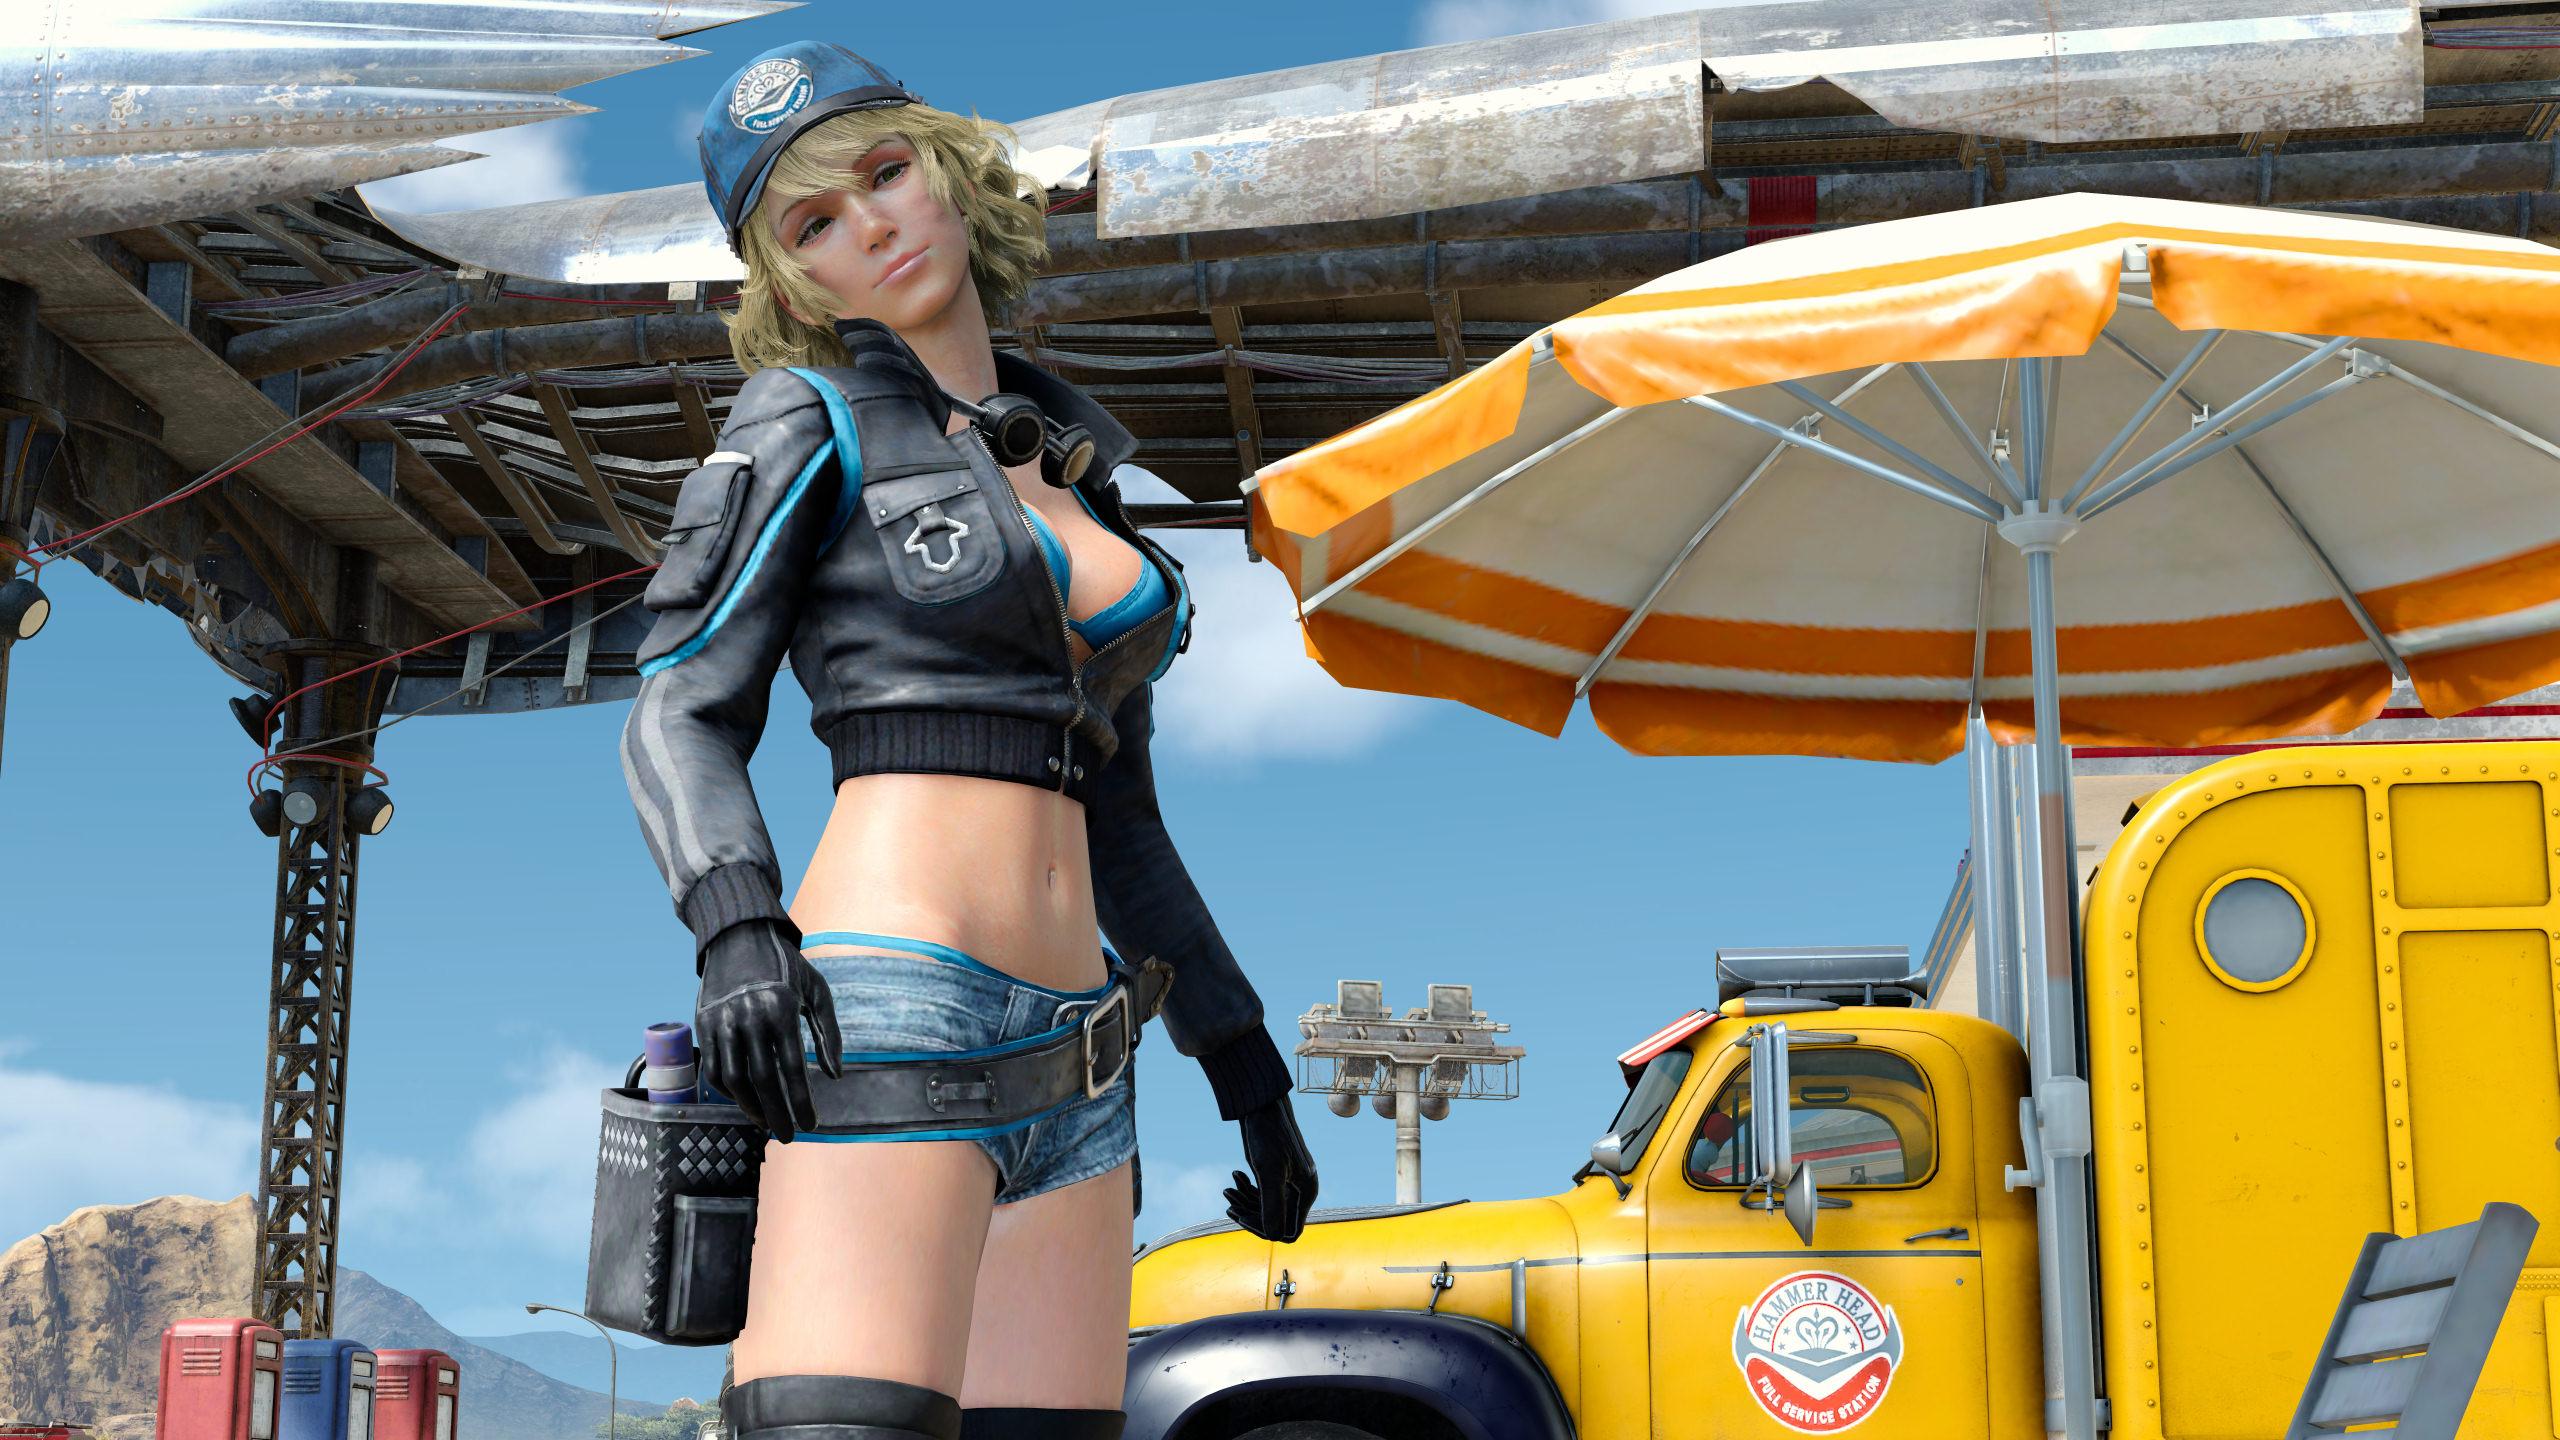 Moah Cindy Final Fantasy Xv